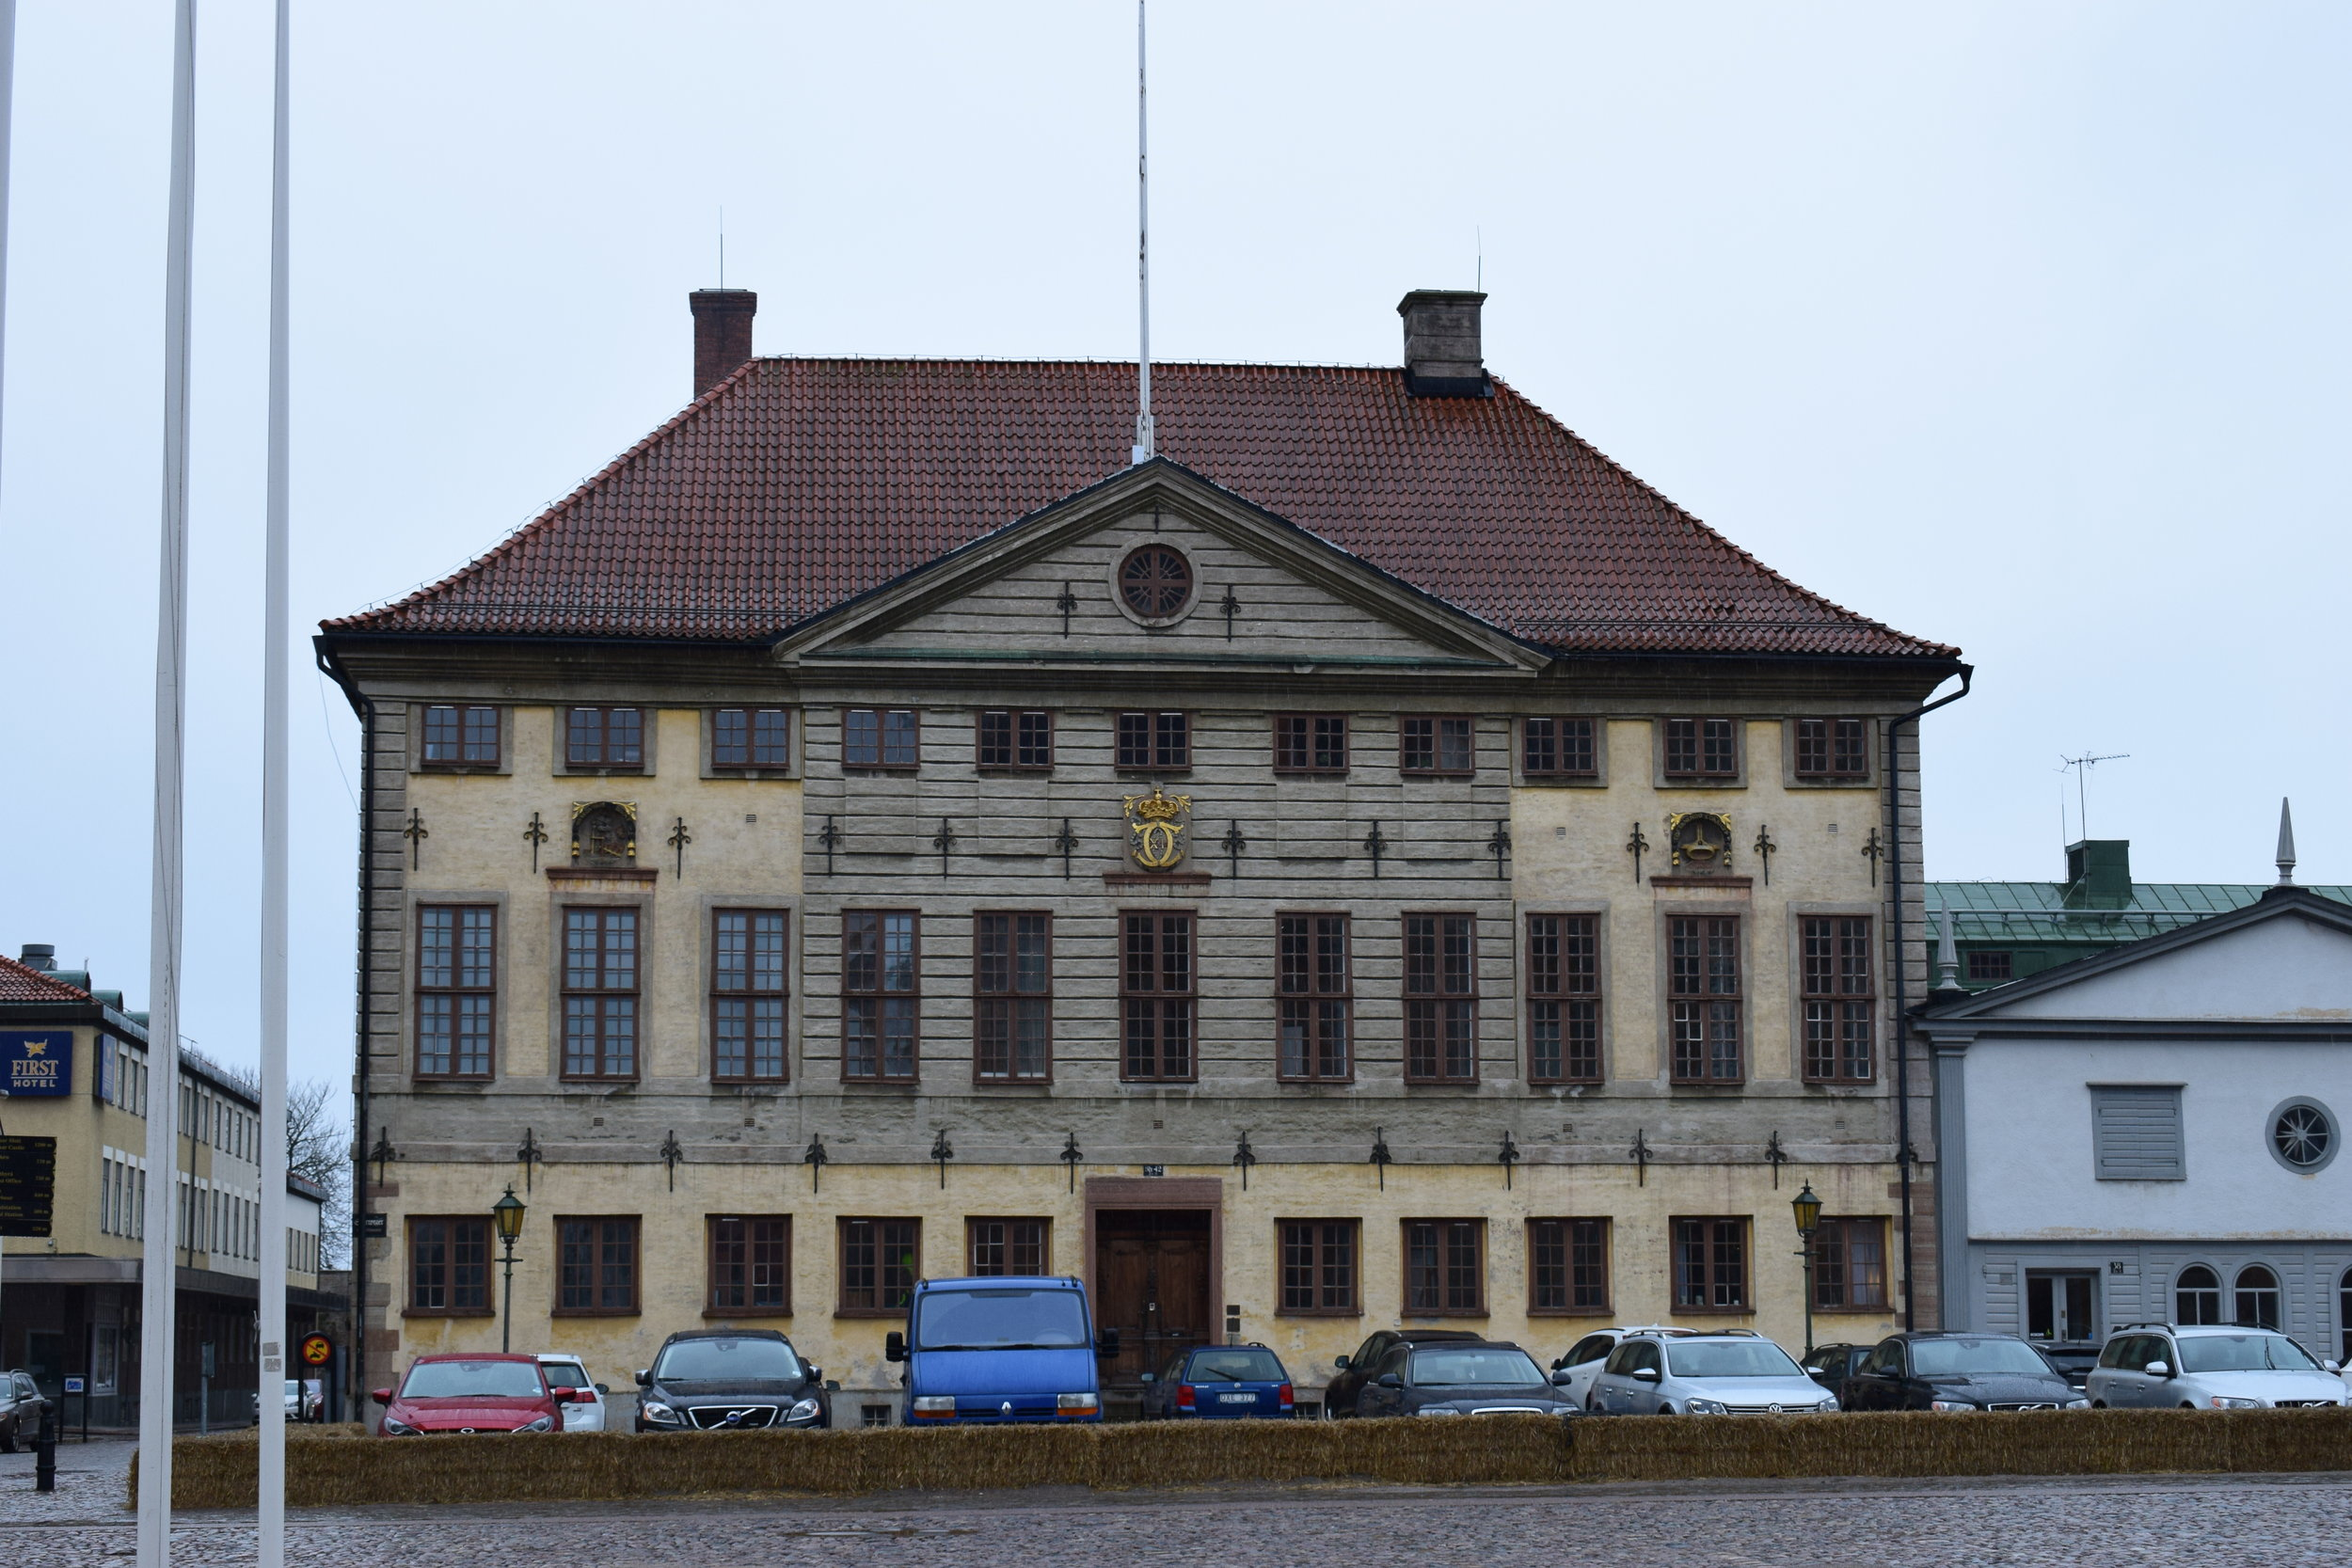 Kalmar City Hall